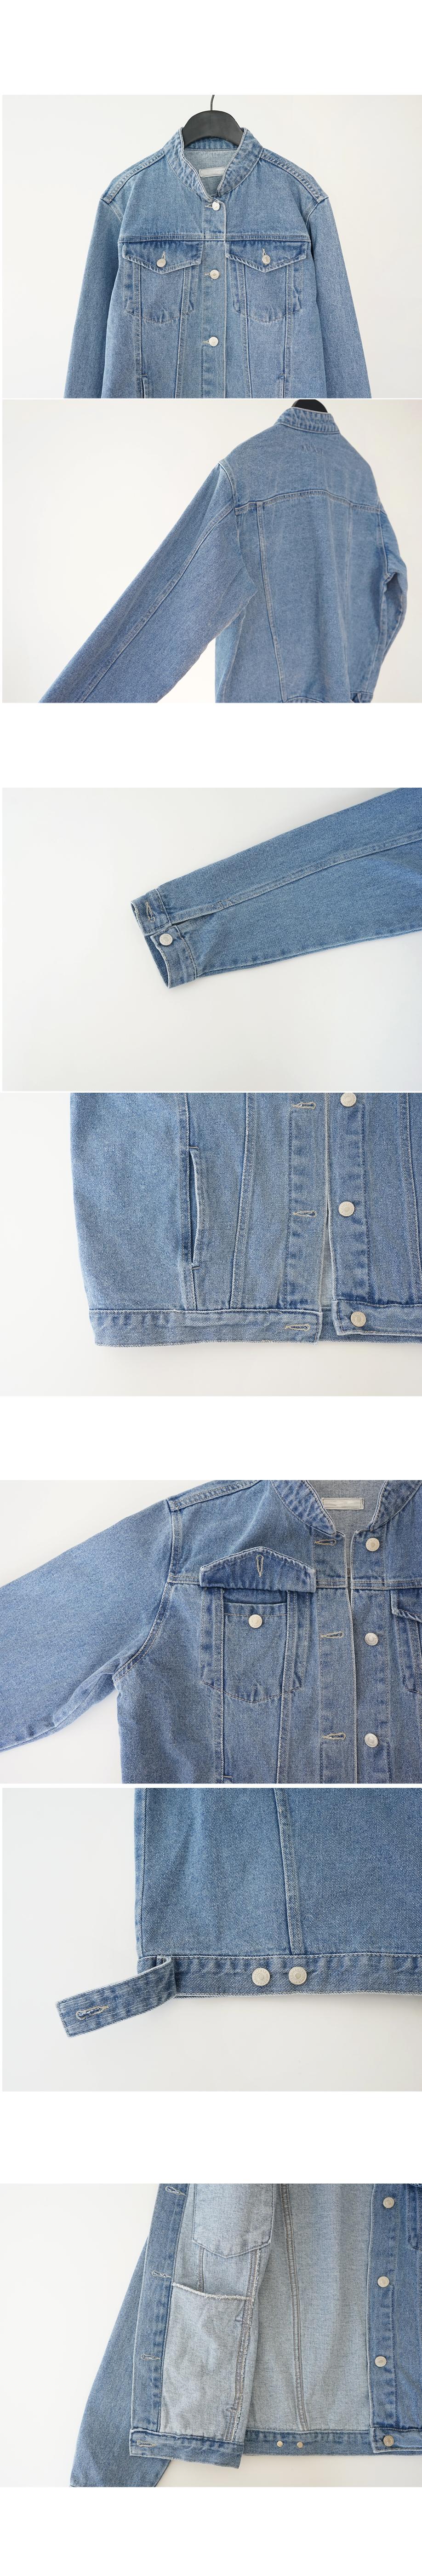 china collar denim jacket